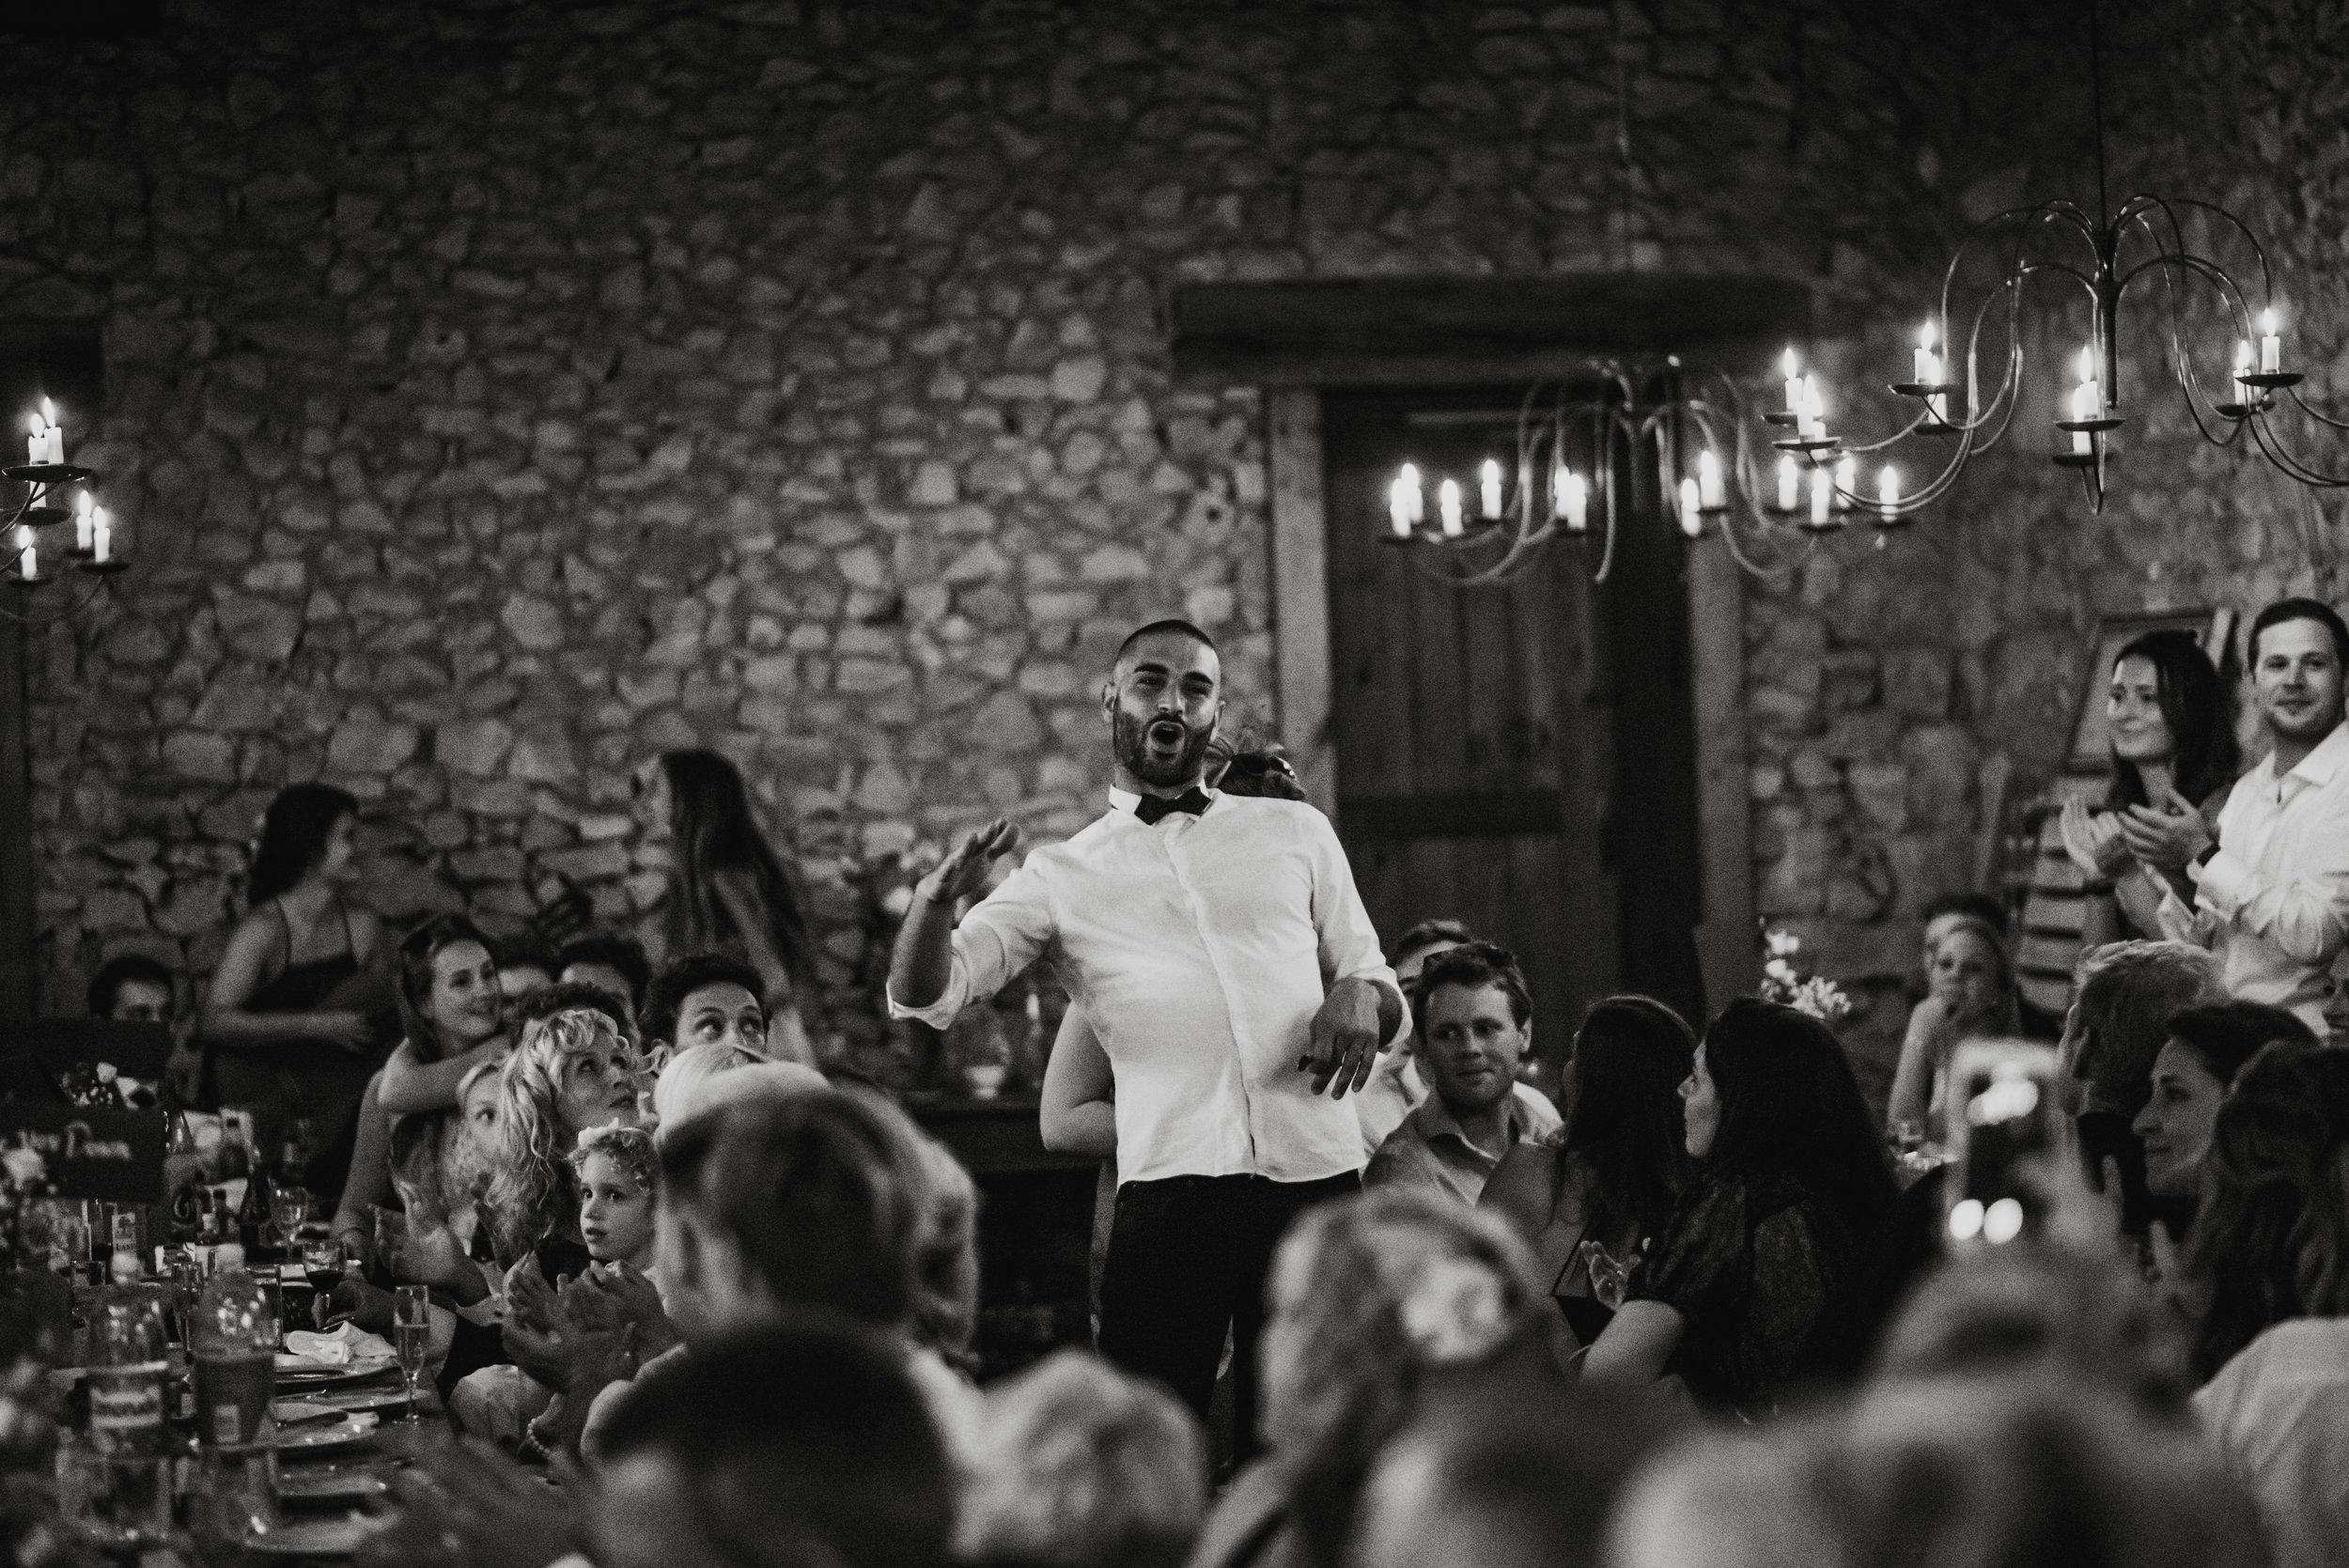 wedding-photographer-dordogne-mark-shaw-71.jpg